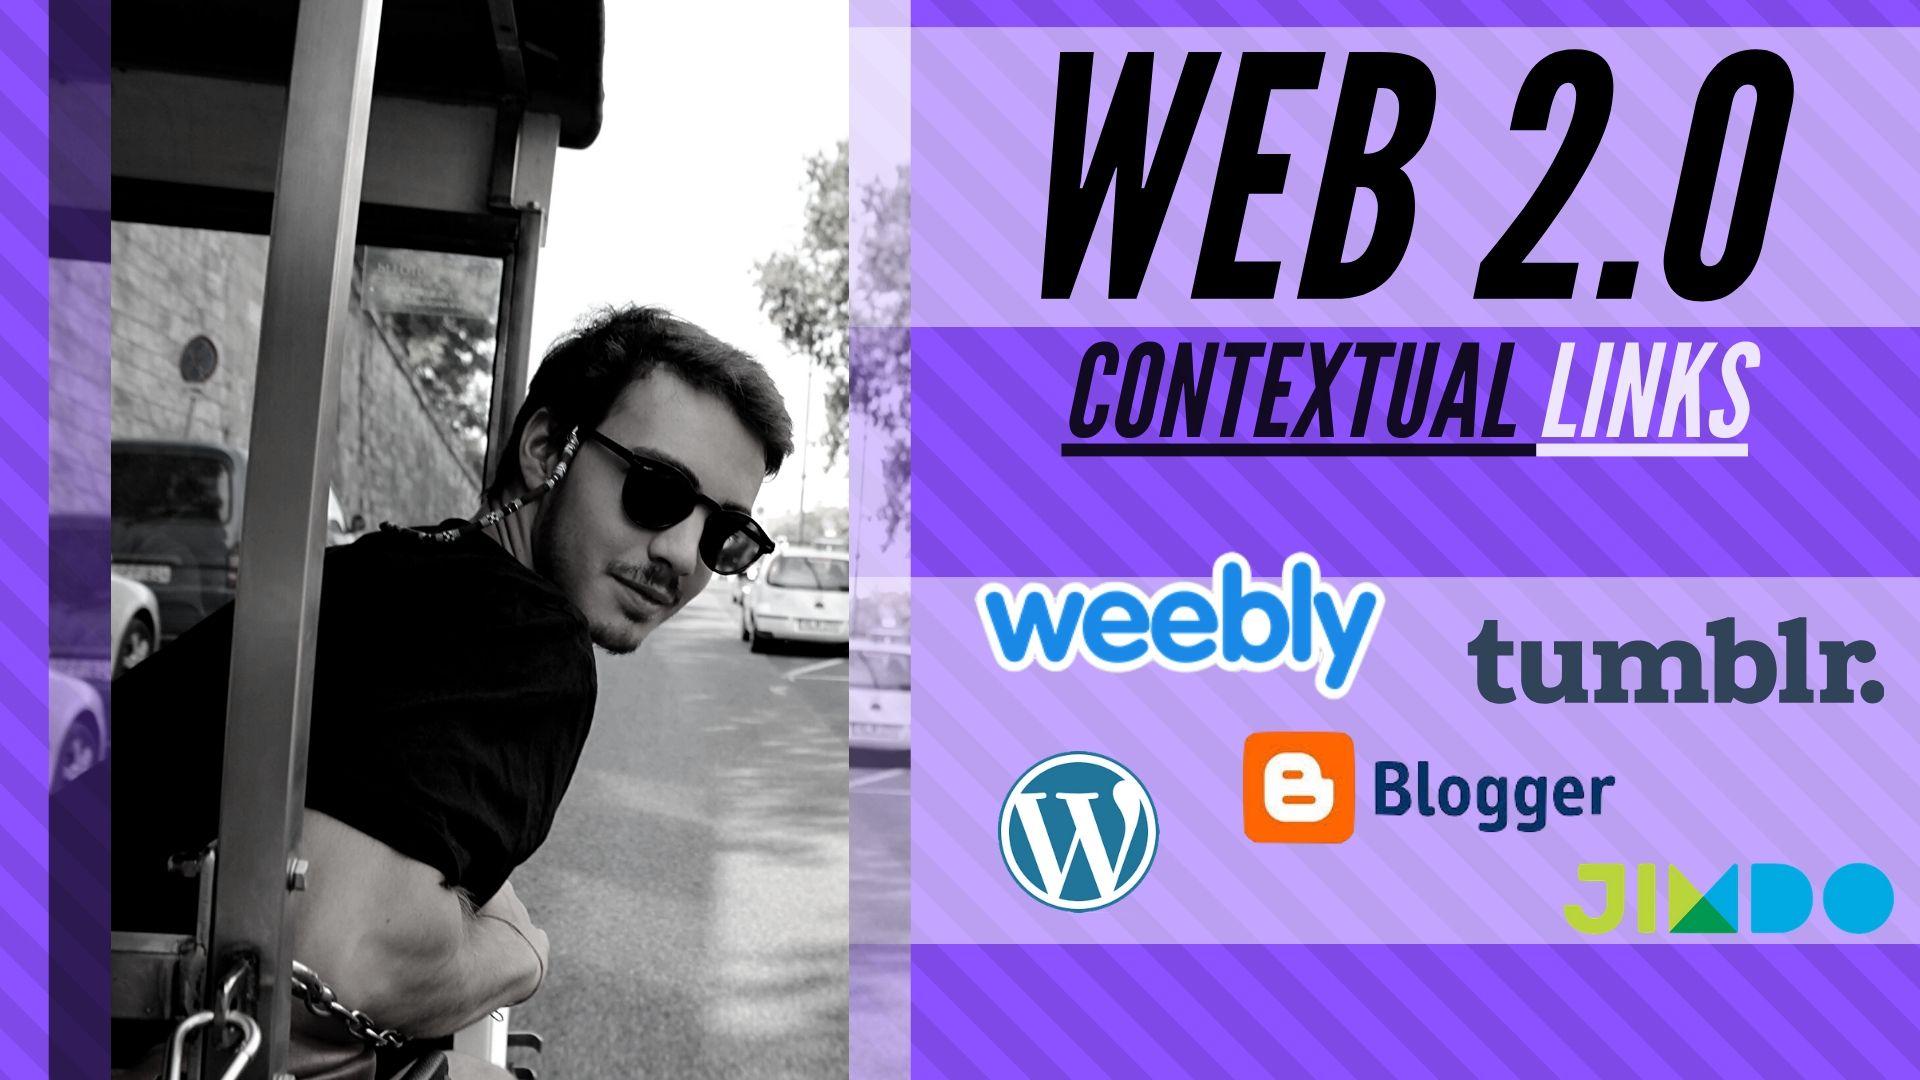 web 2.0 network